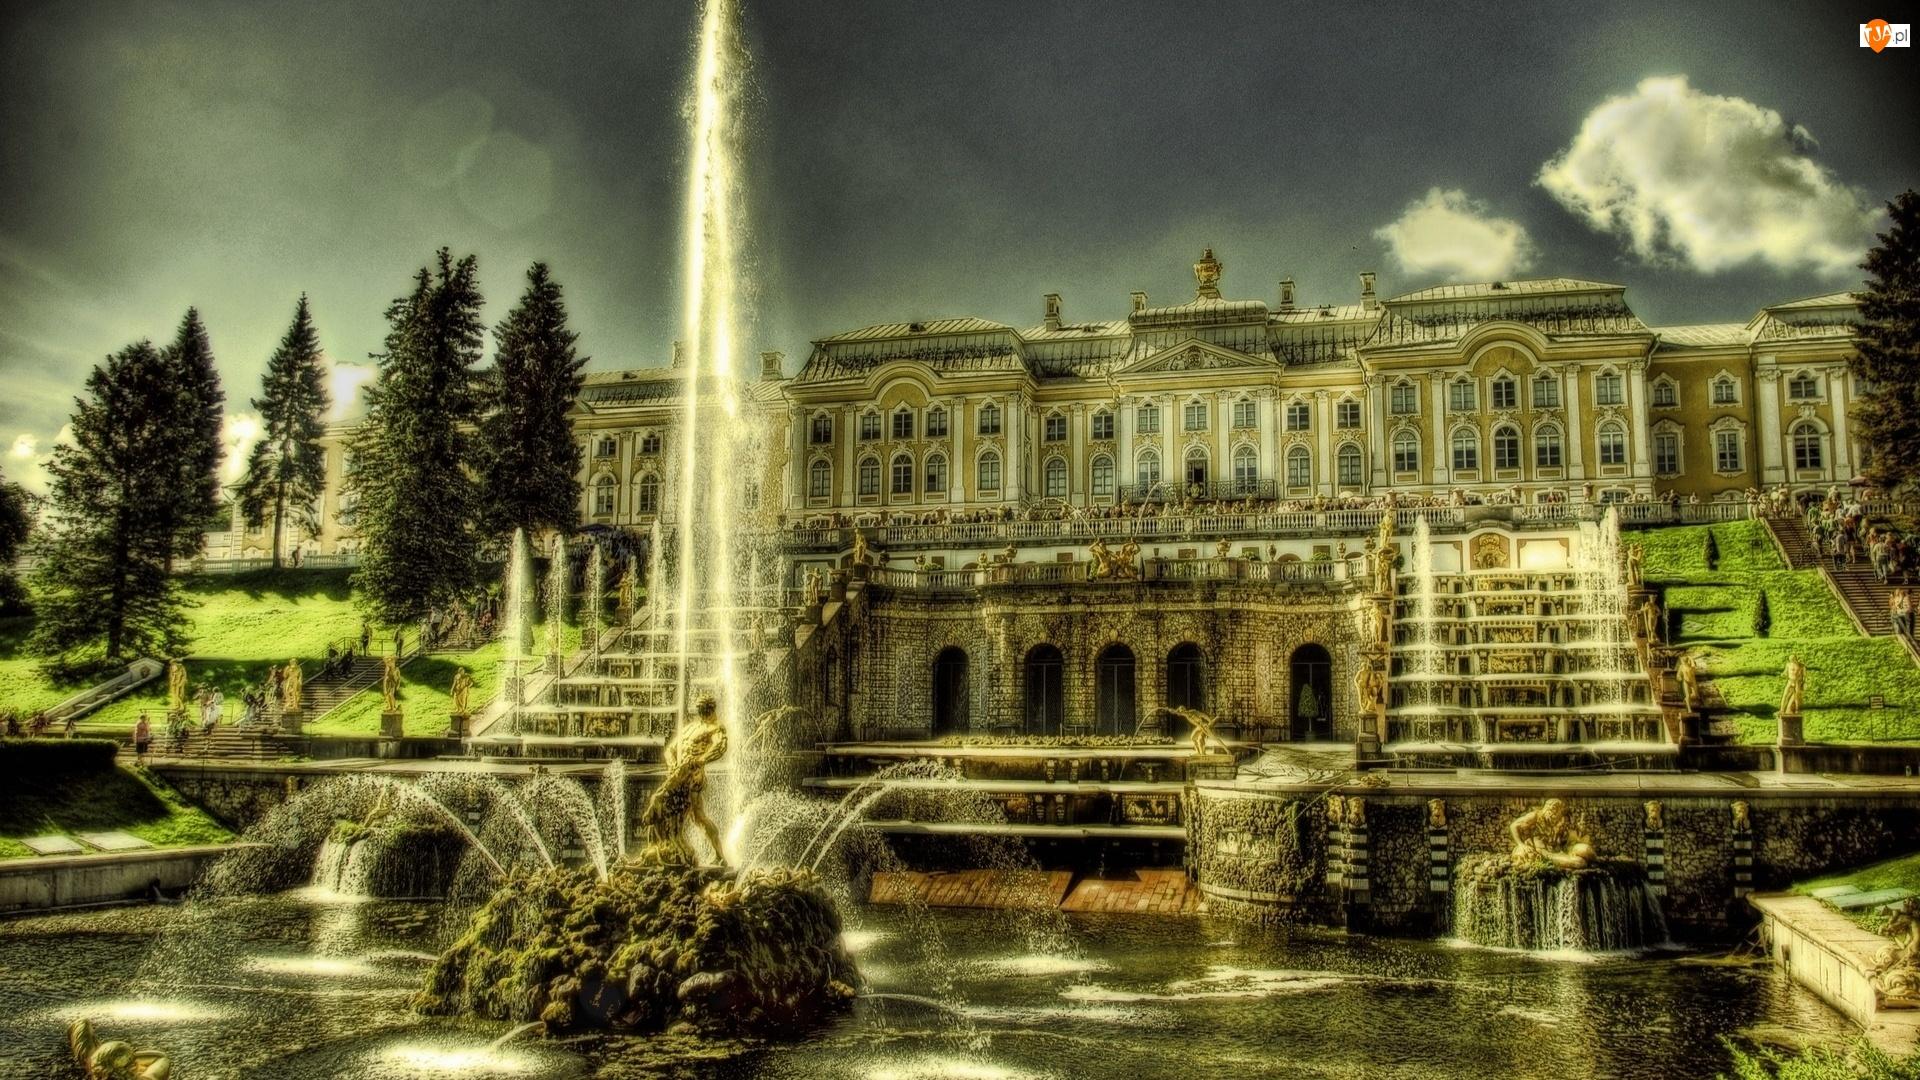 Pałac, Rosja, Fontanna, Peterhof